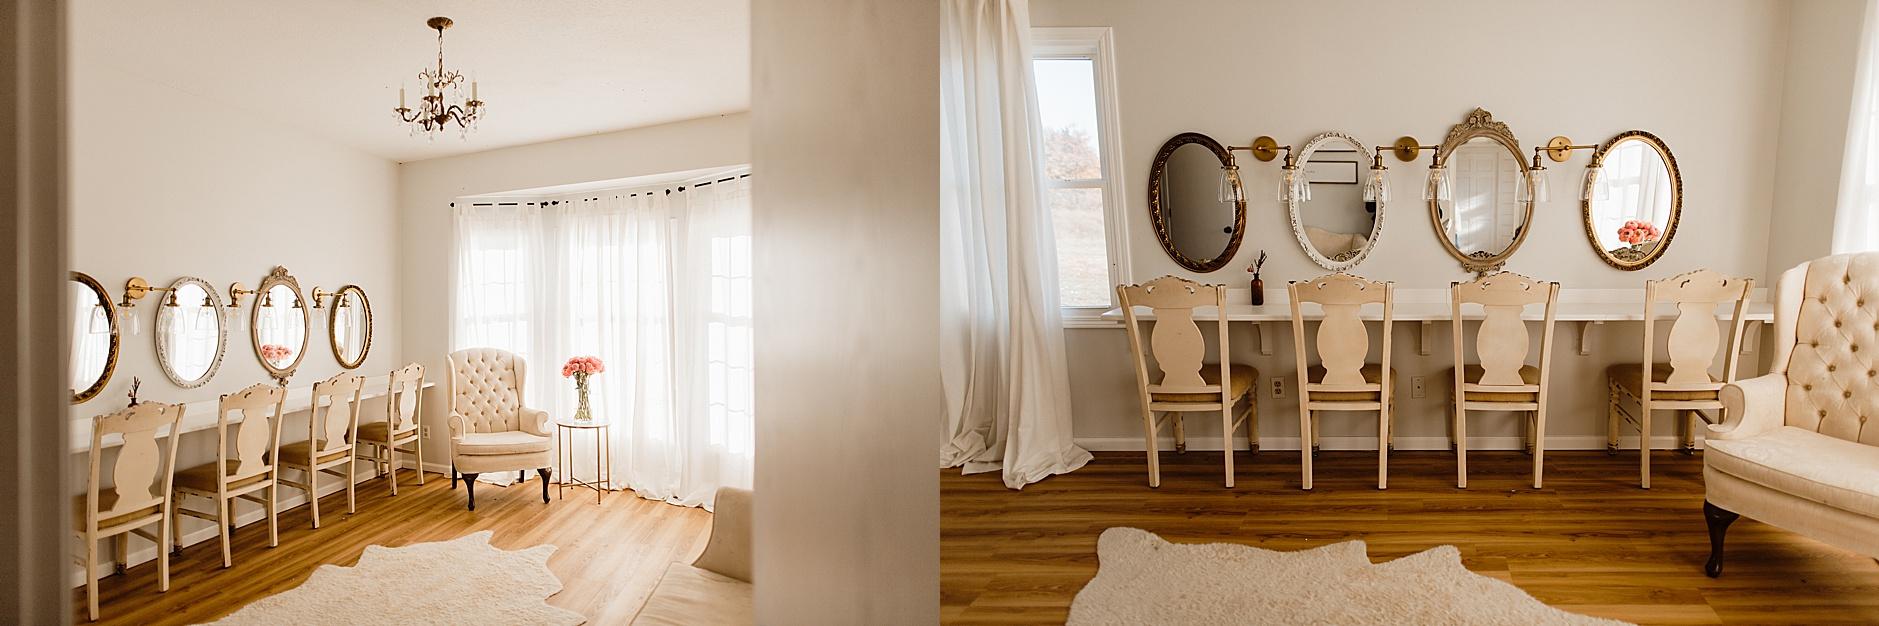 kansas city wedding venue inspiration-9537.jpg